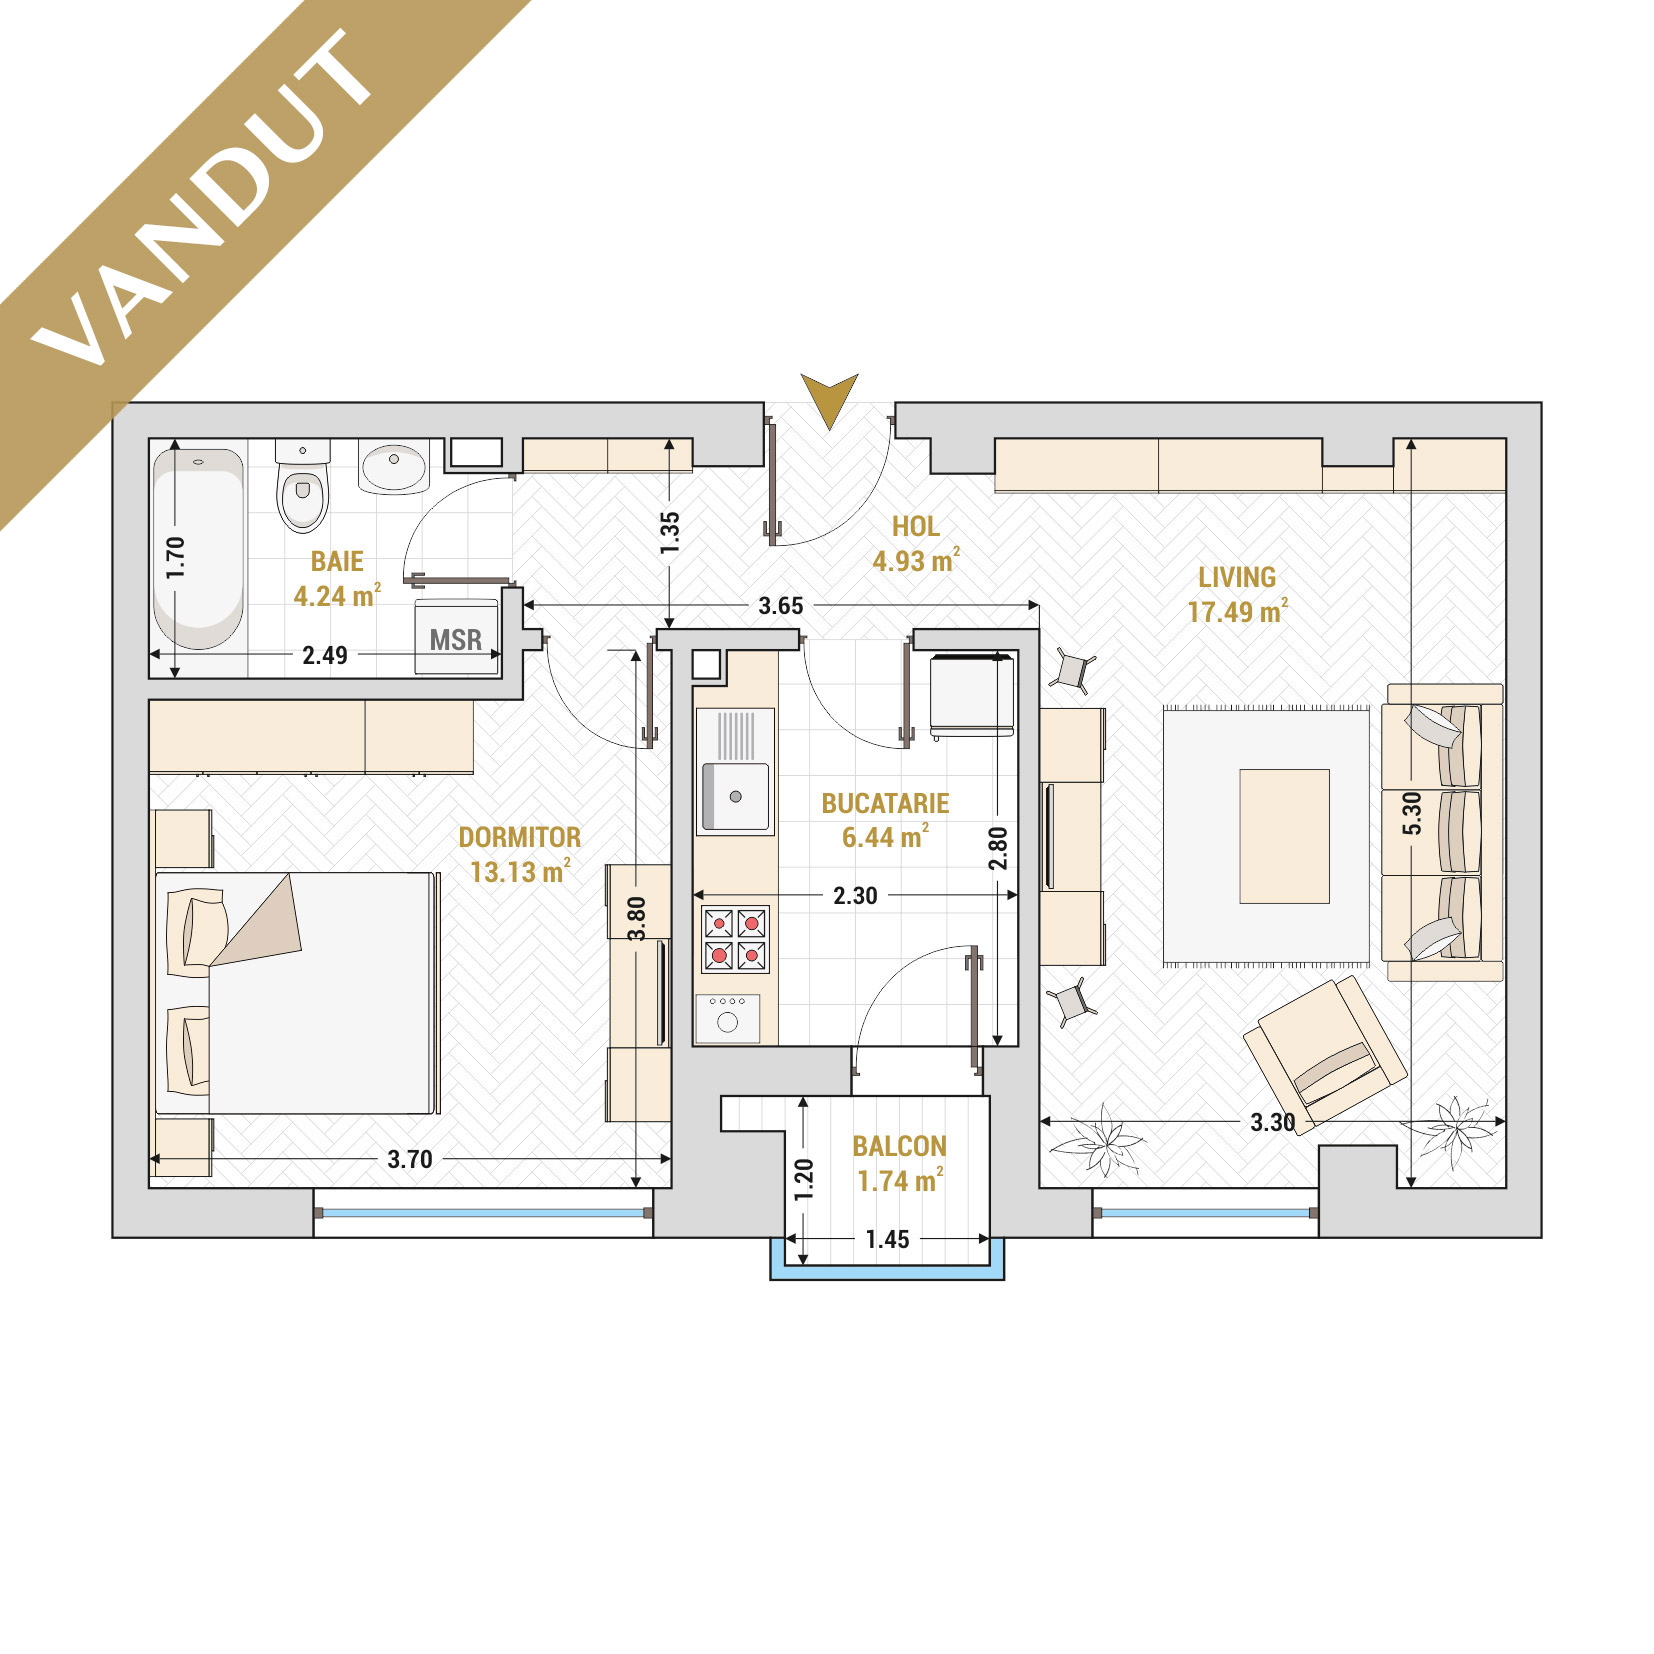 Apartament 2 camere de vanzare Bucuresti - Catedral Residence - Marriott, Piata Unirii, 13 Septembrie, Izvor - Tip 1 - T1 - V